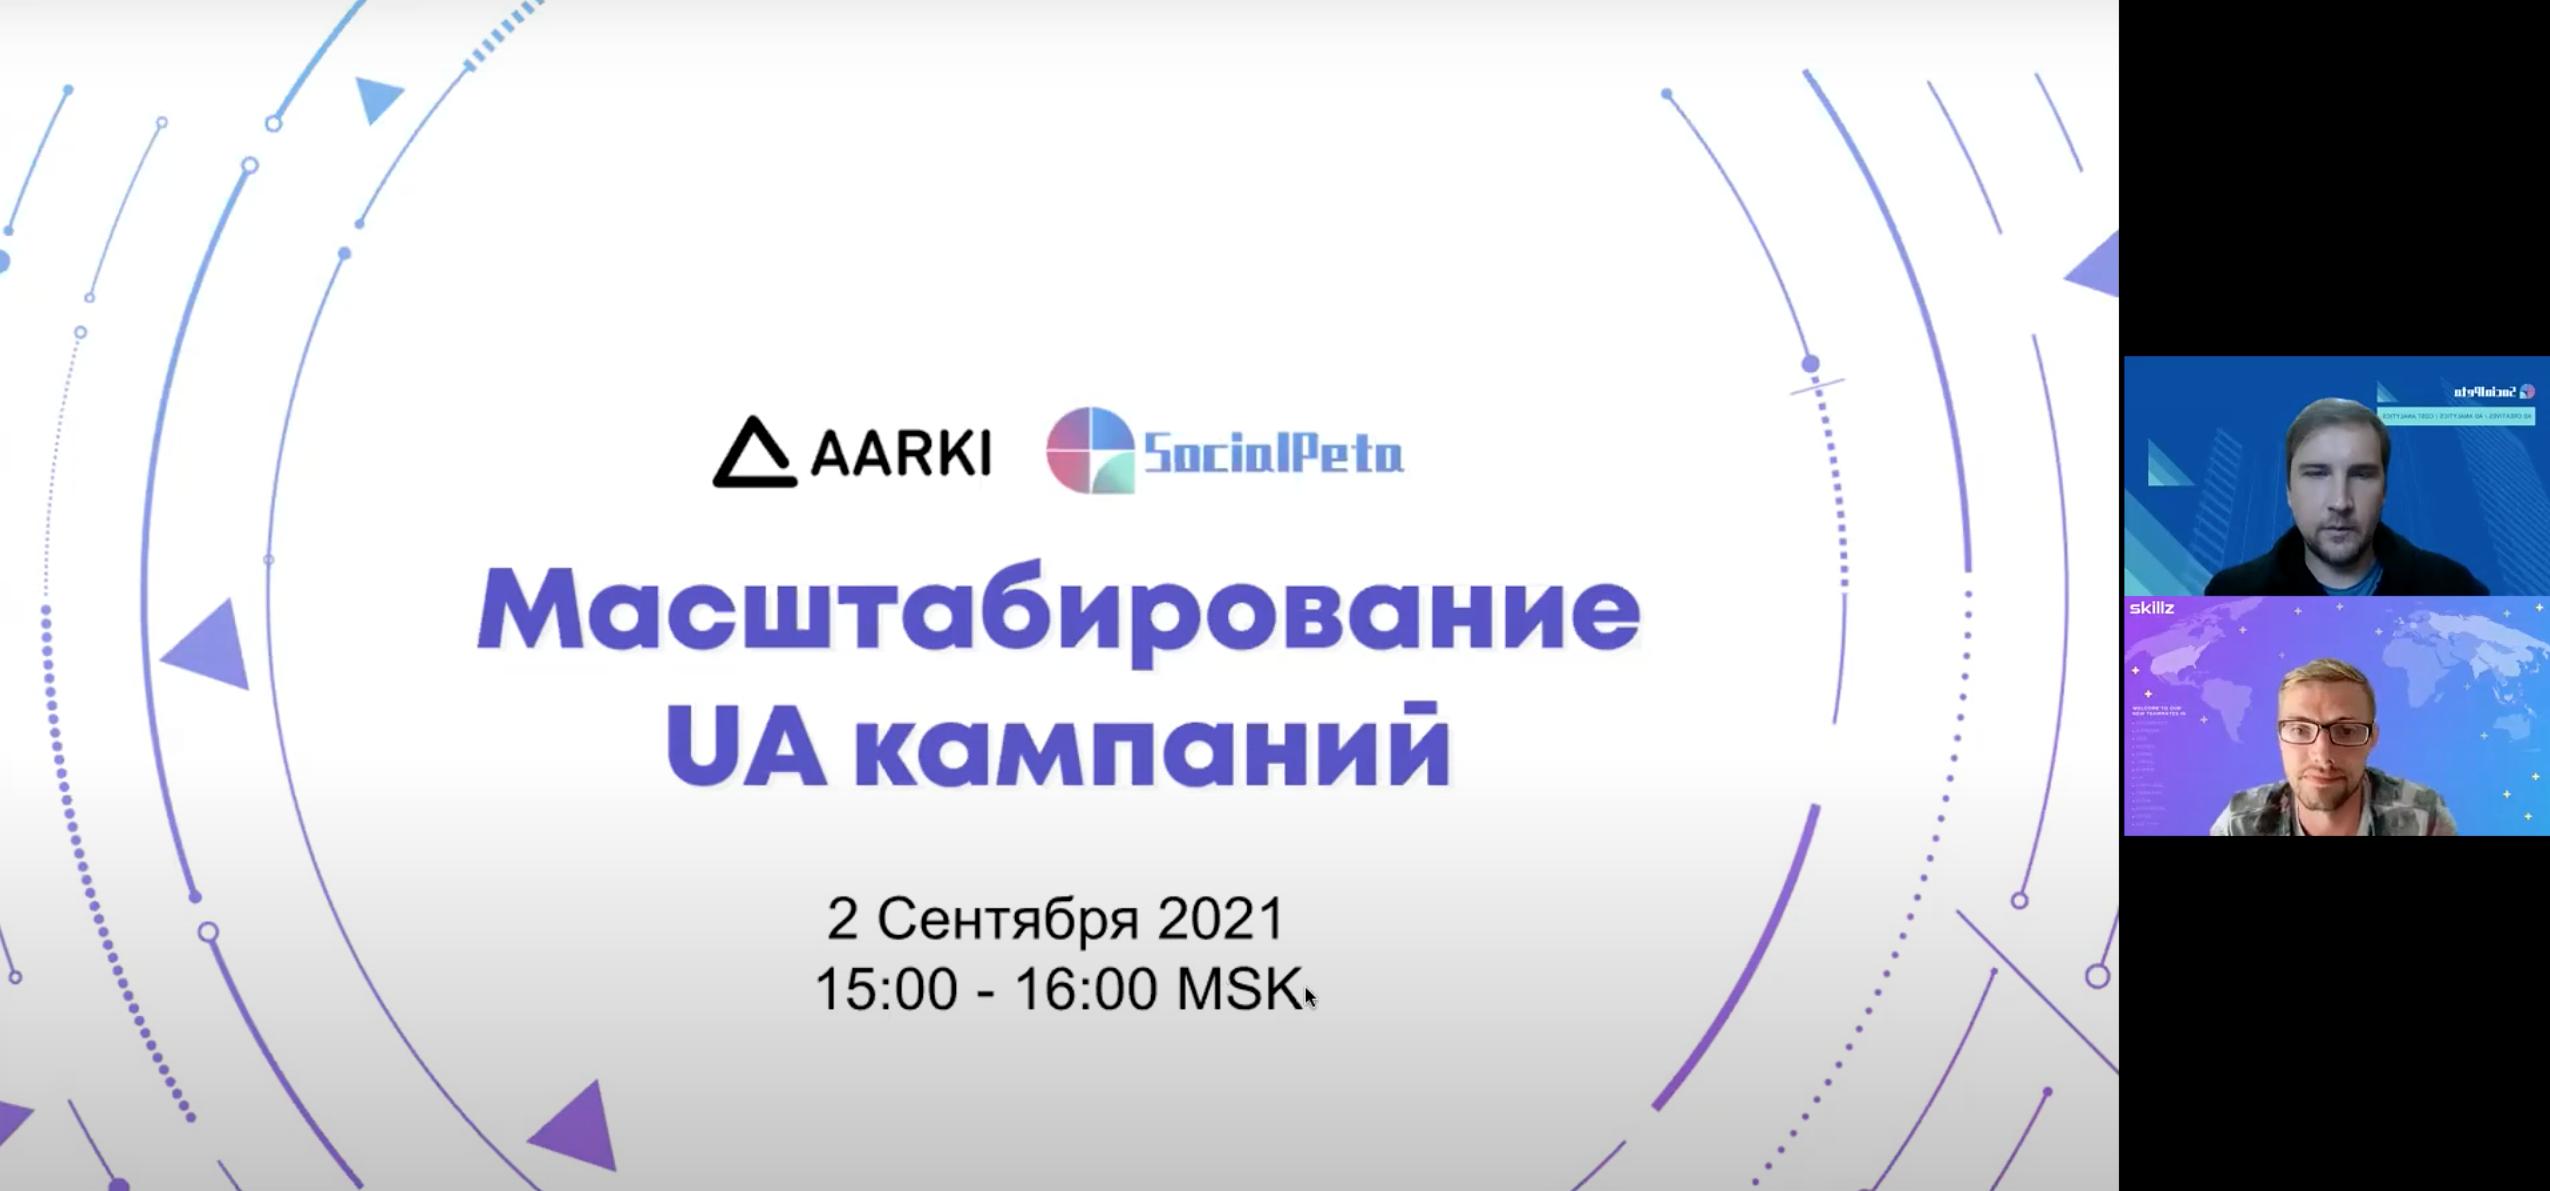 Scaling UA Performance for Mobile Apps Globally Aarki SocialPeta Webinar for Russia Audience